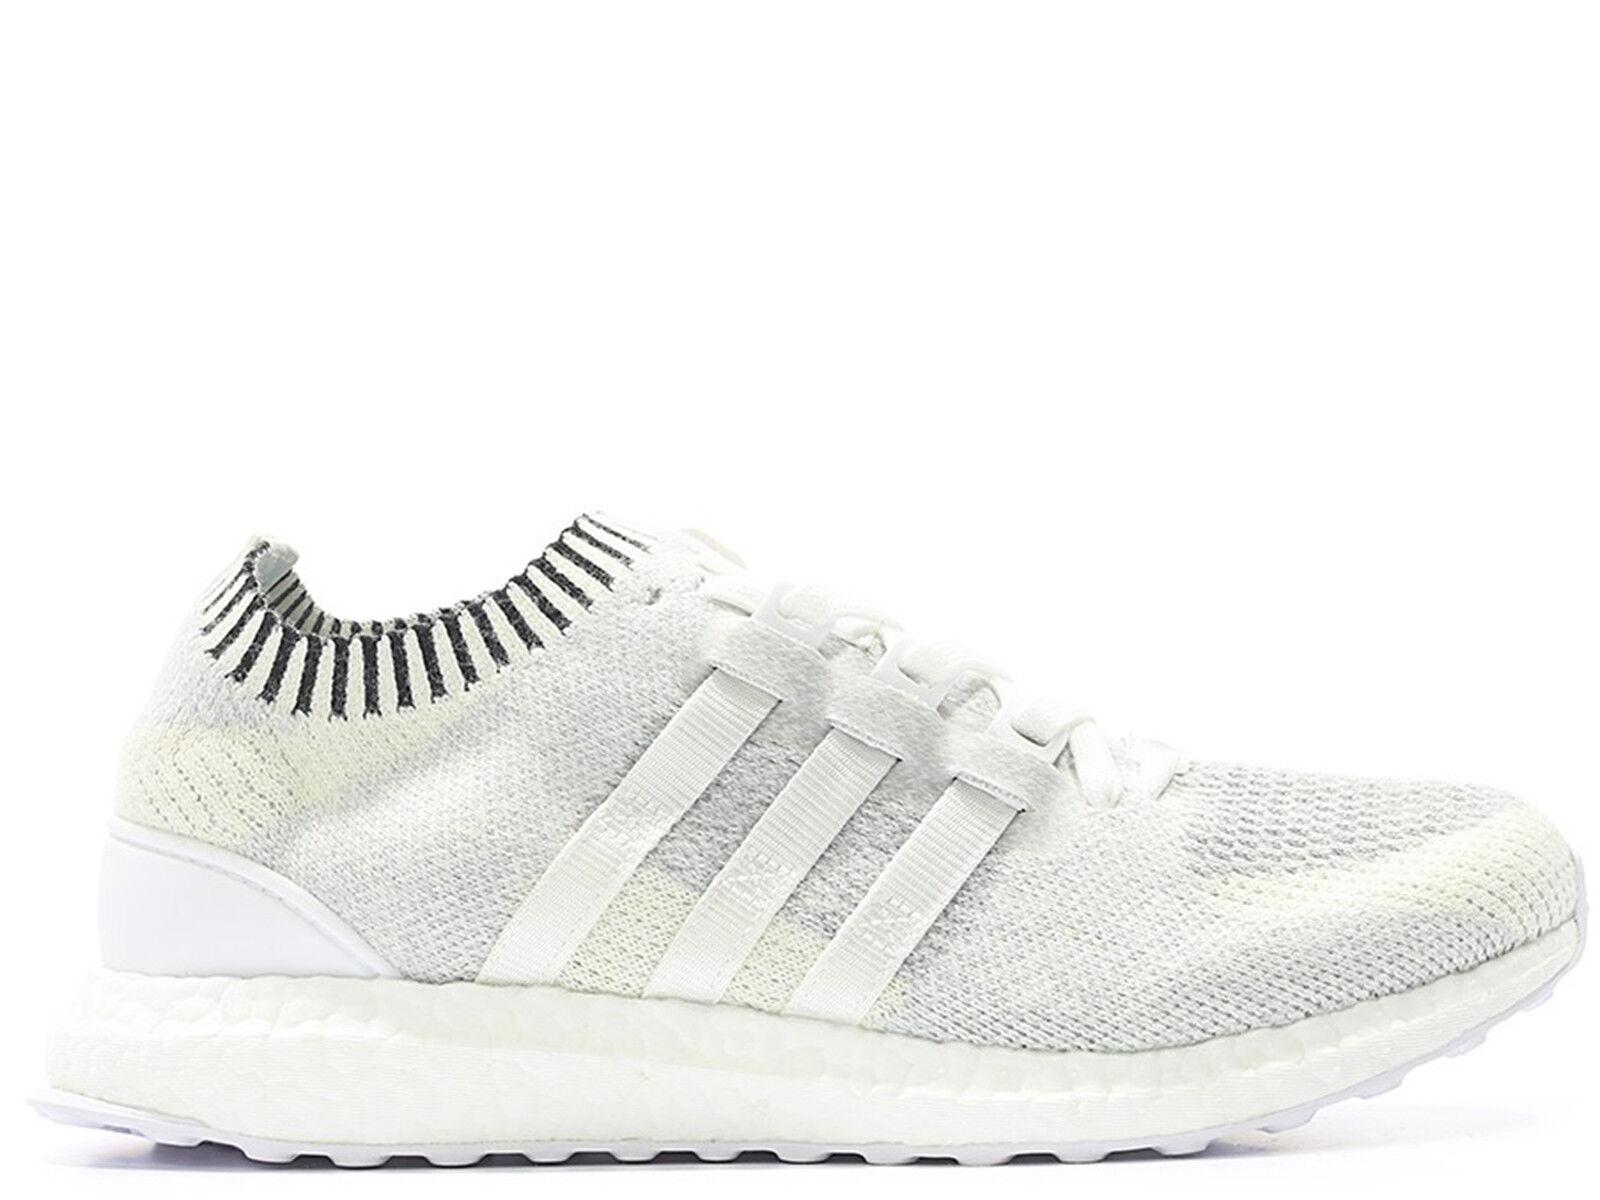 b6f5bc90ff94 Men s Brand New Adidas EQT Support Ultra PK Athletic Fashion Fashion  Fashion Sneakers  BB1242